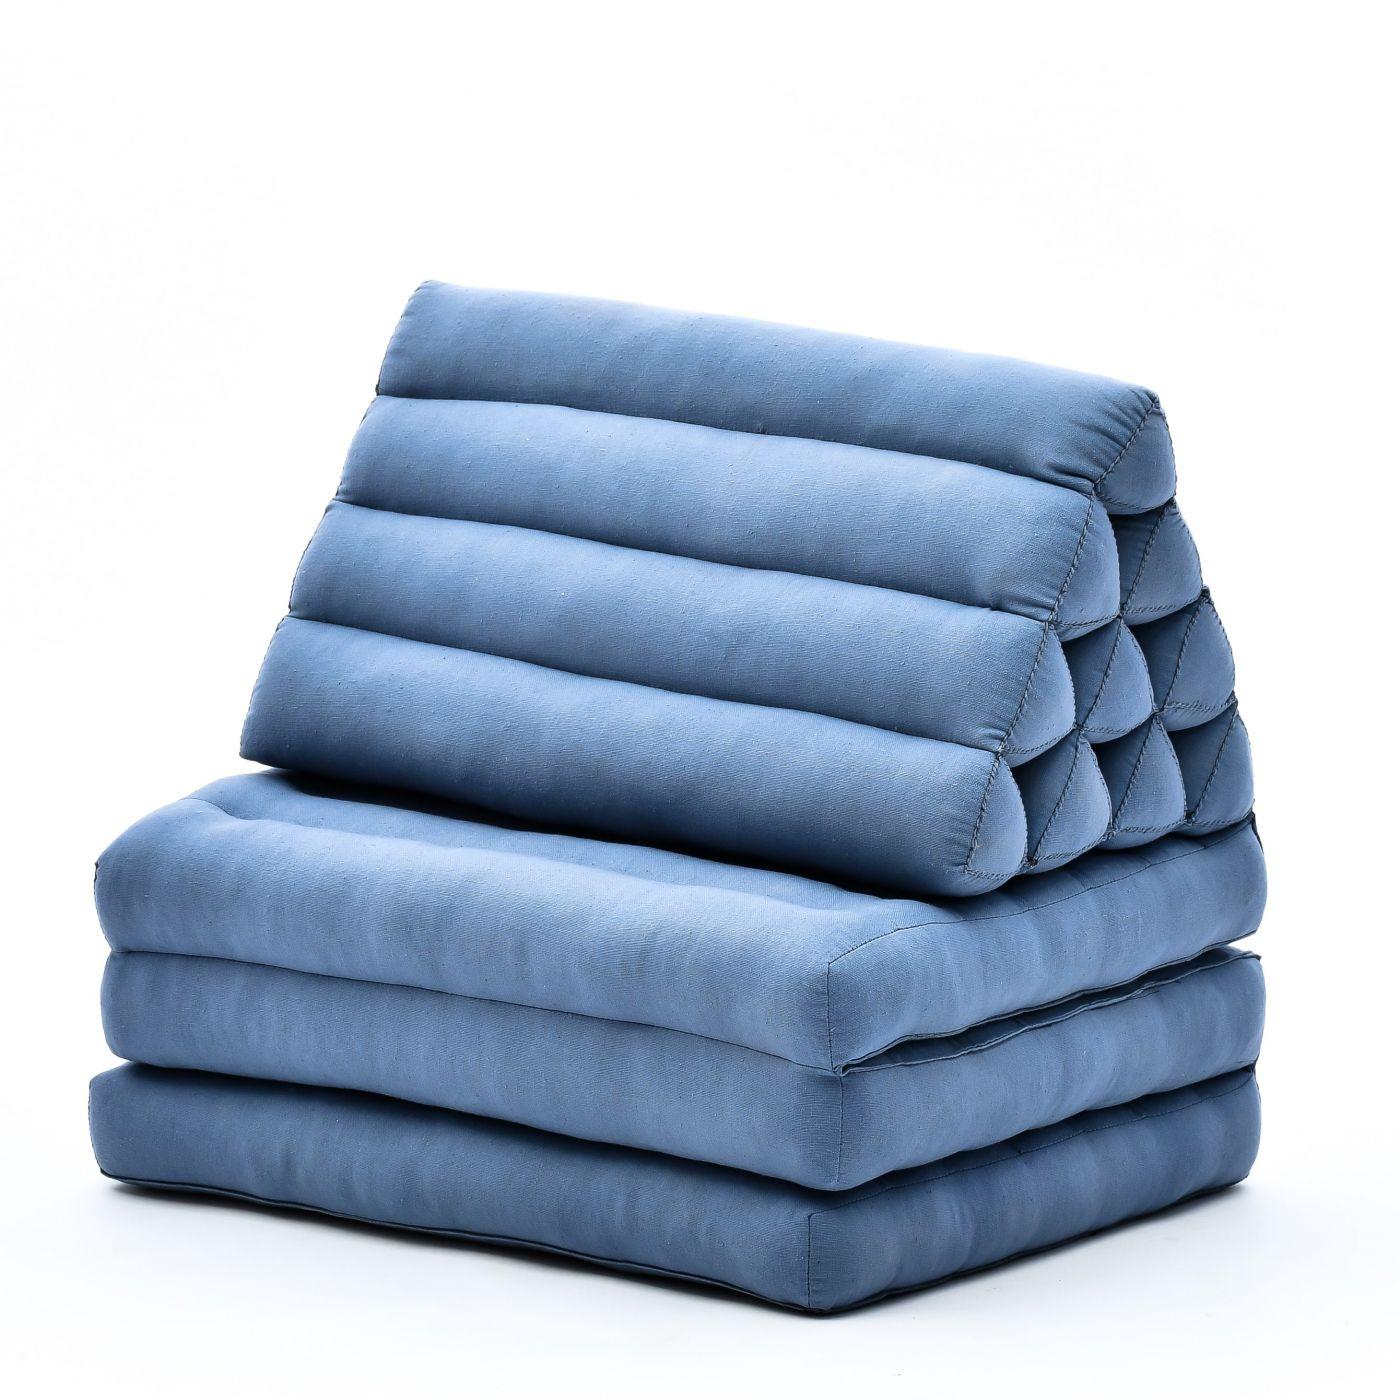 Leewadee Foldout Triangle Thai Cushion